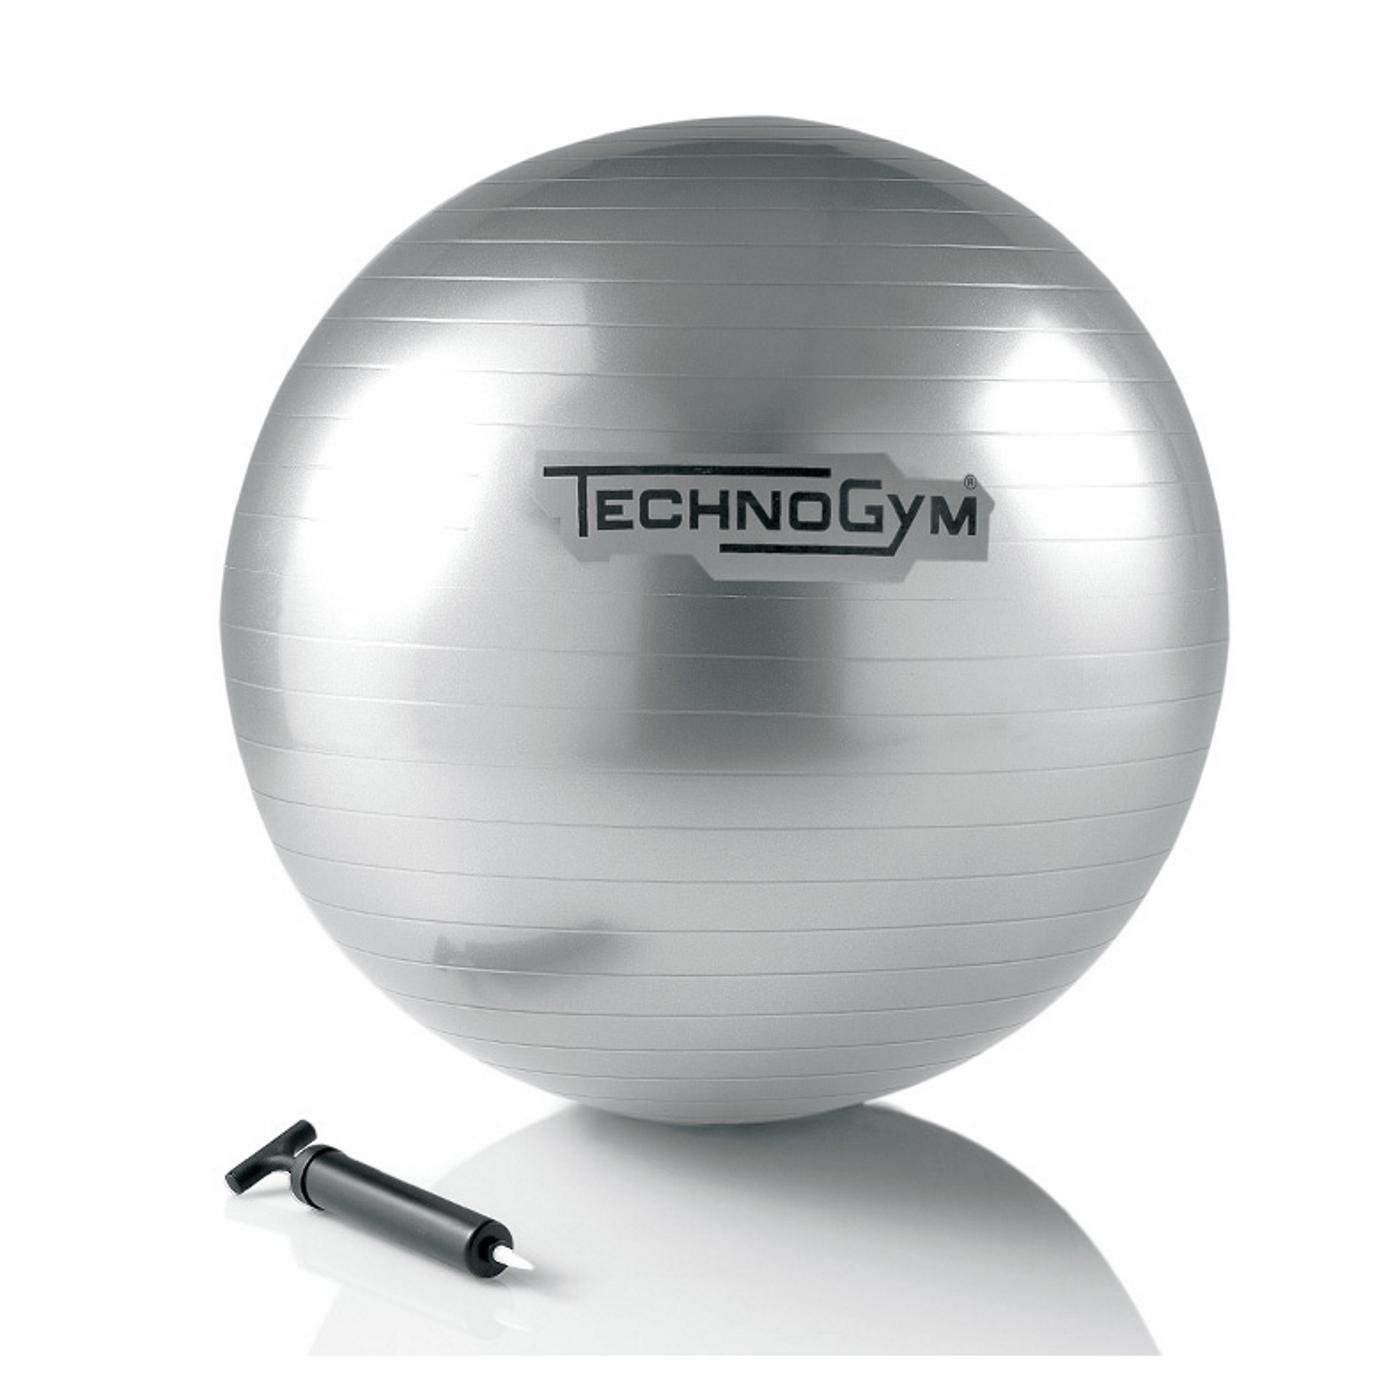 Technogym Wellness Ball (55cm)